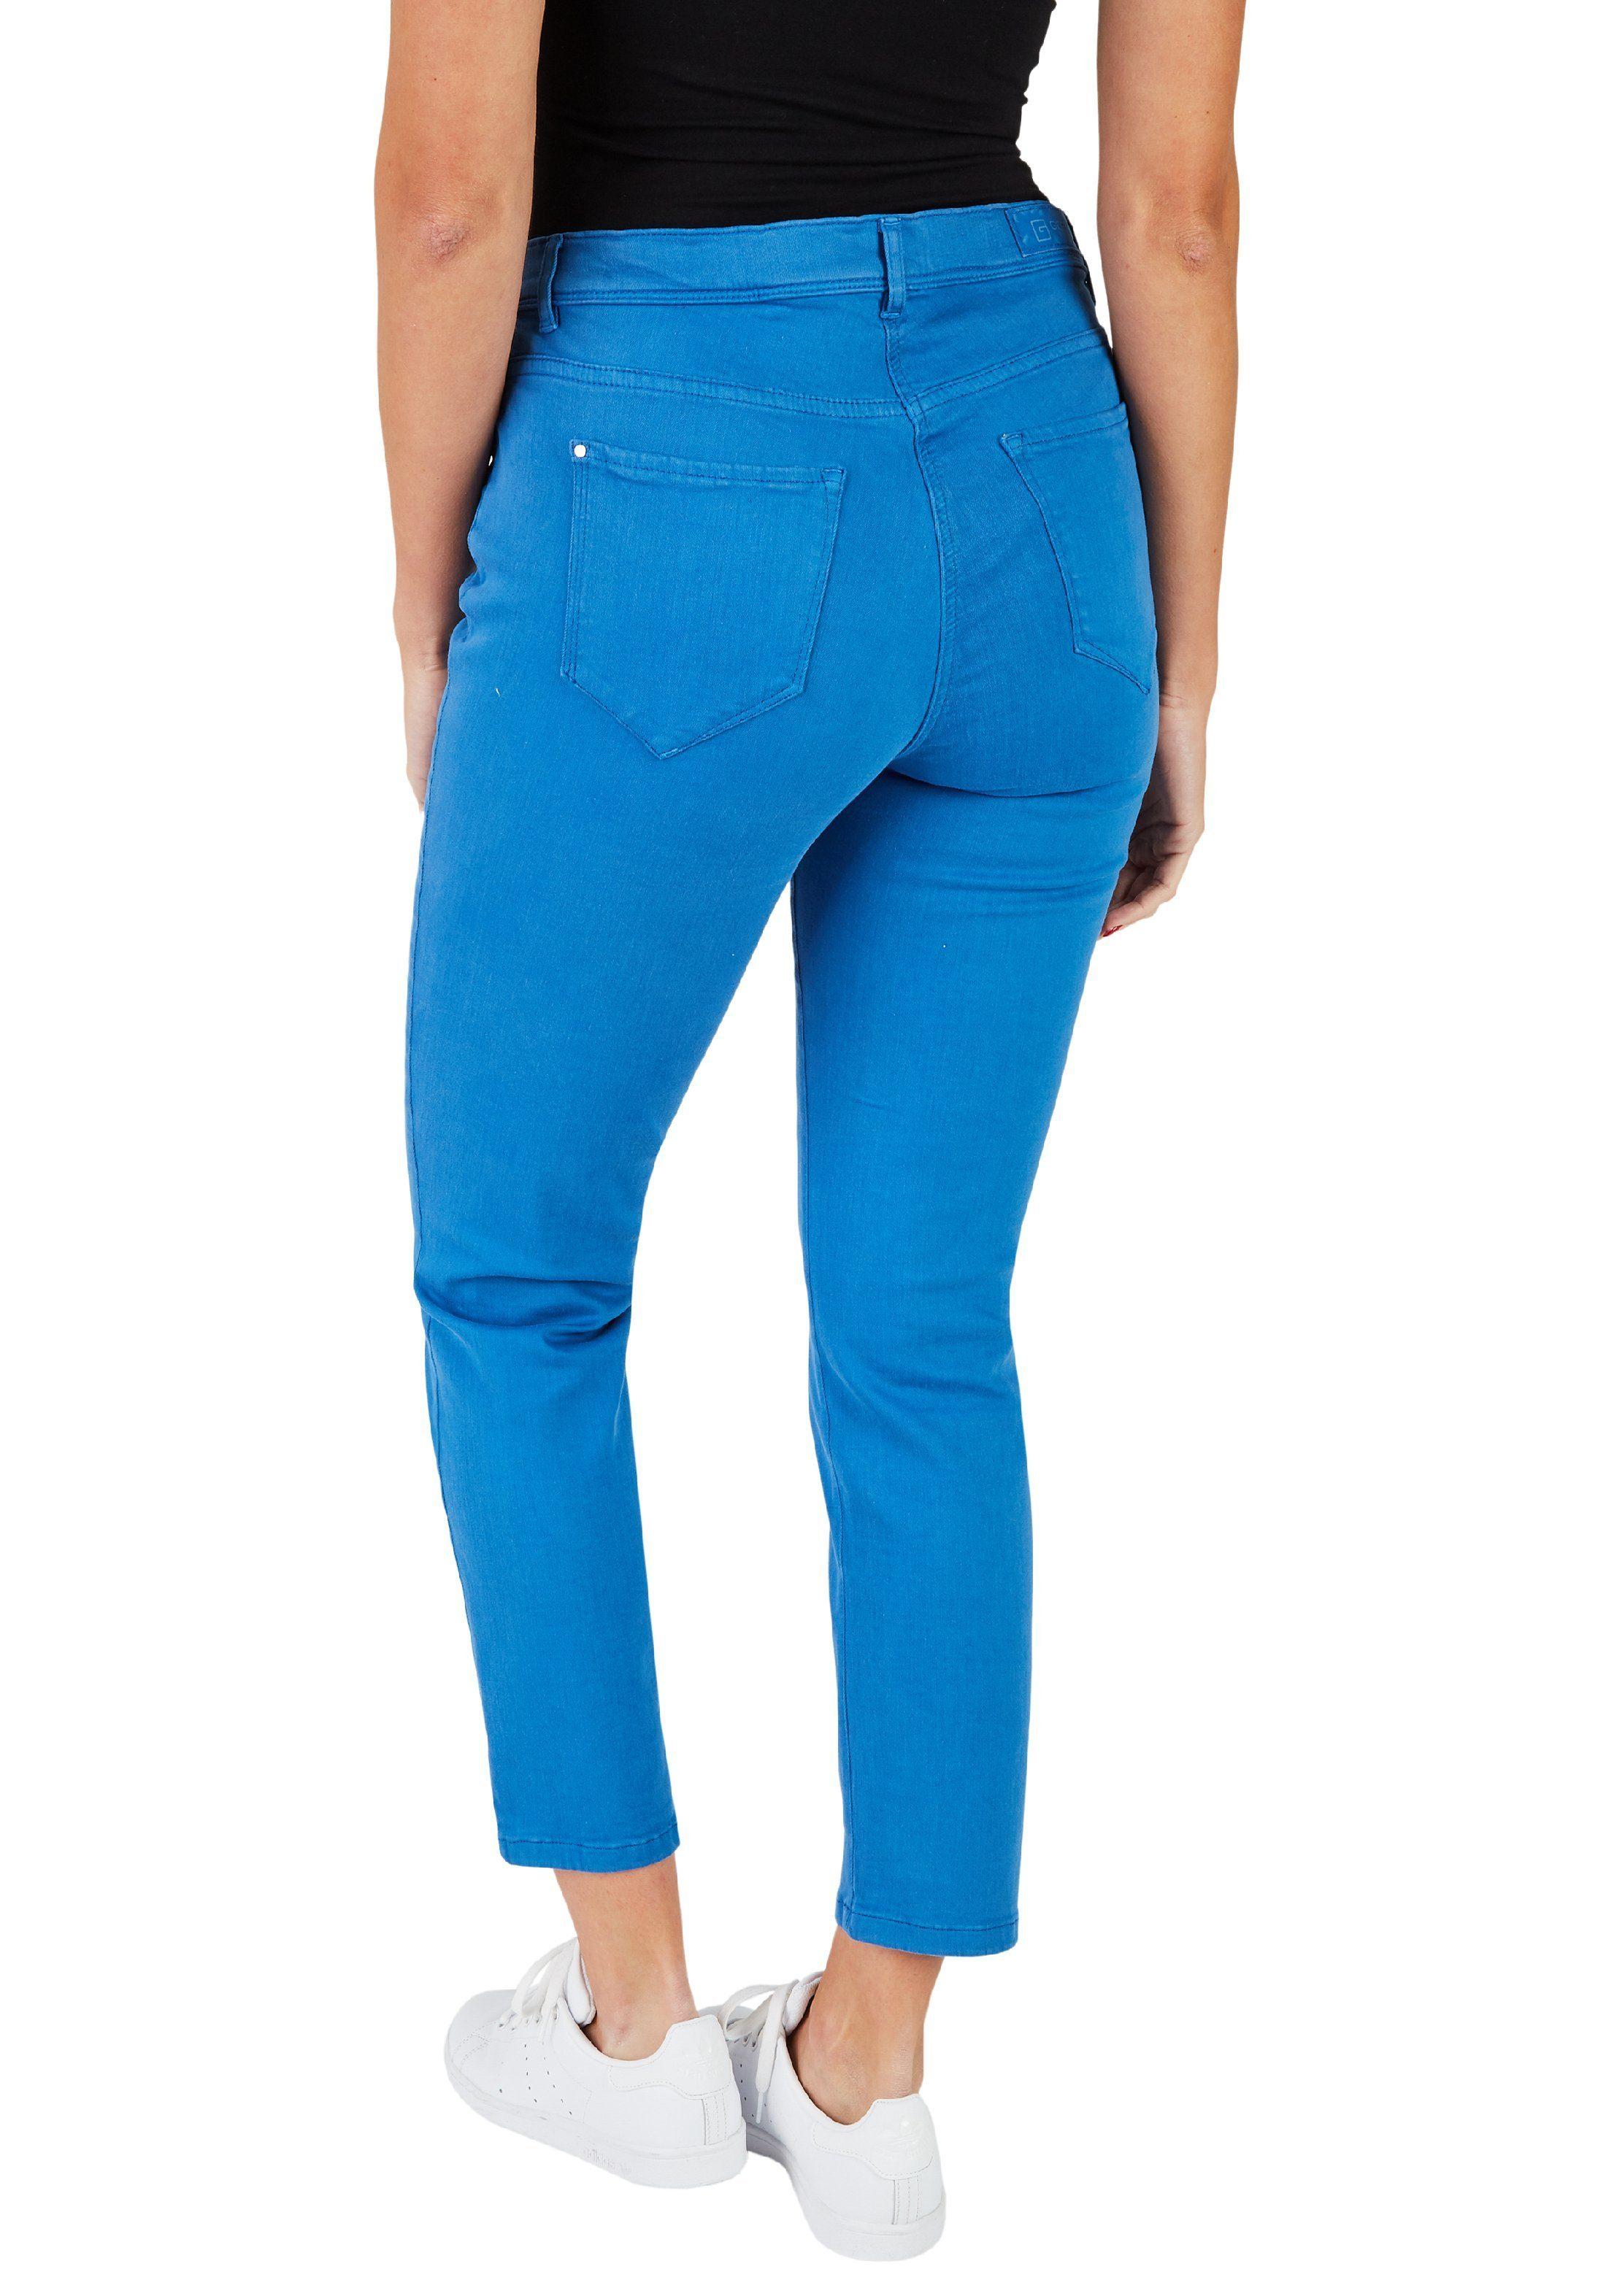 Gerke My Pants 7/8-broek Lilo 3 Cropped Makkelijk Gekocht - Geweldige Prijs